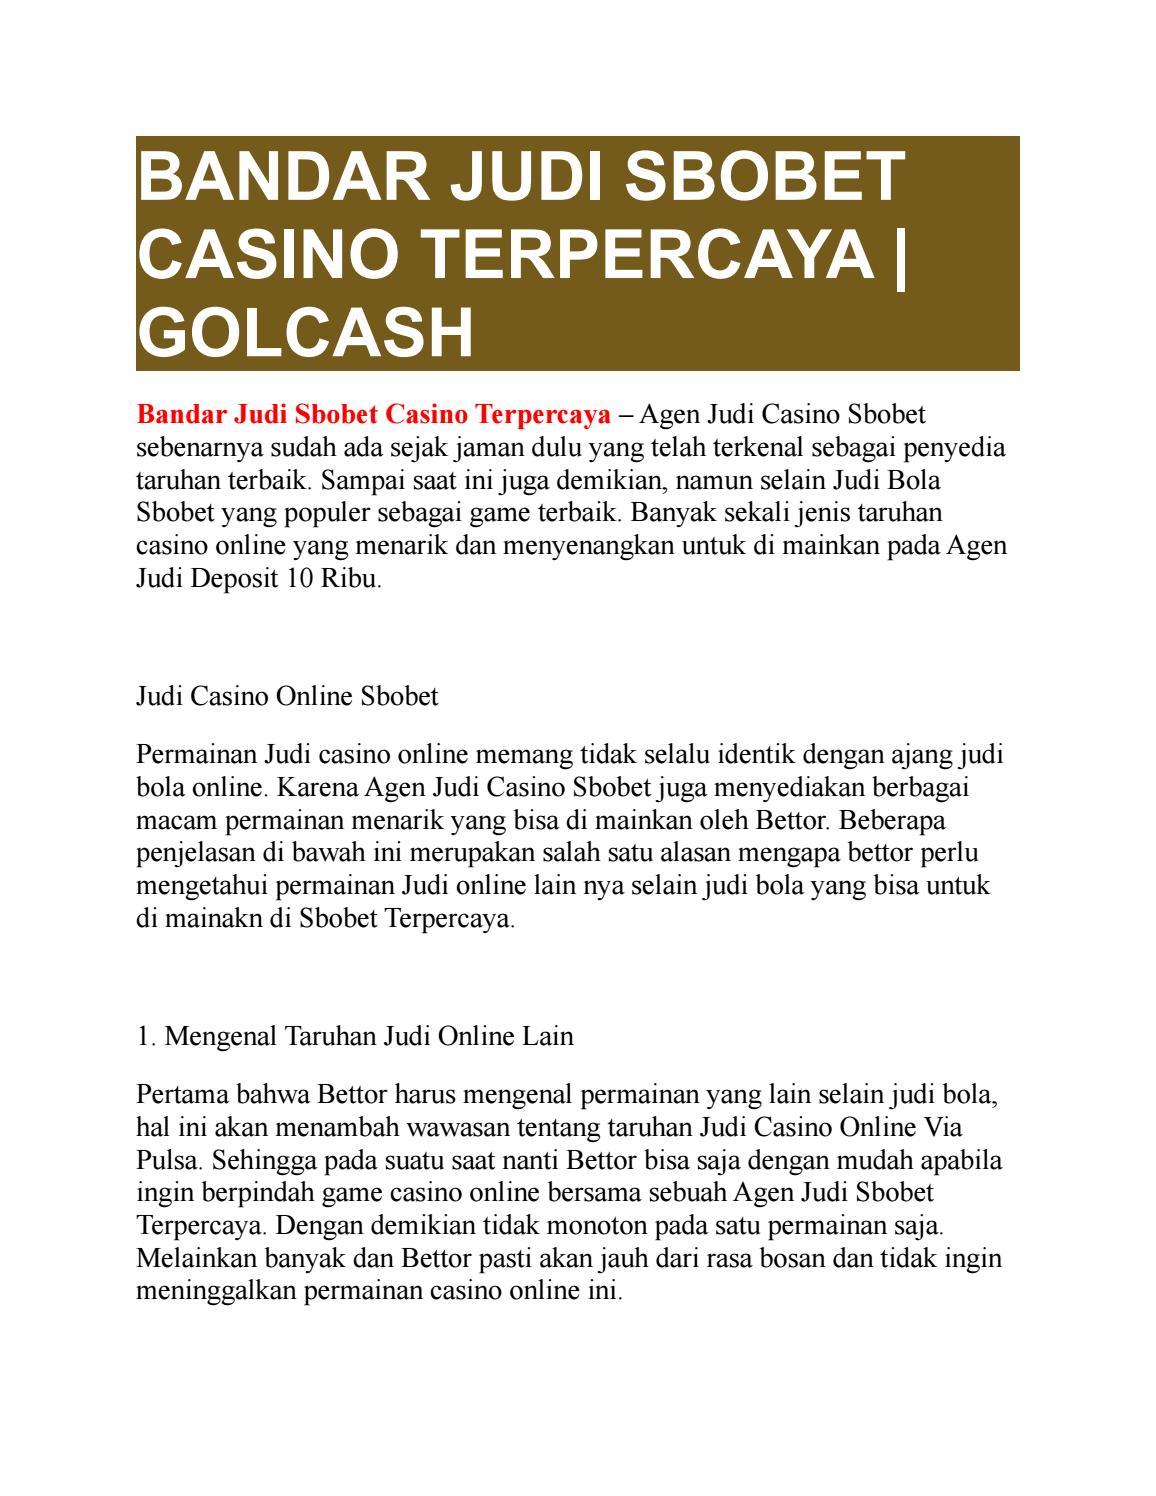 Bandar Judi Sbobet Casino Terpercaya Golcash By Golcash Issuu